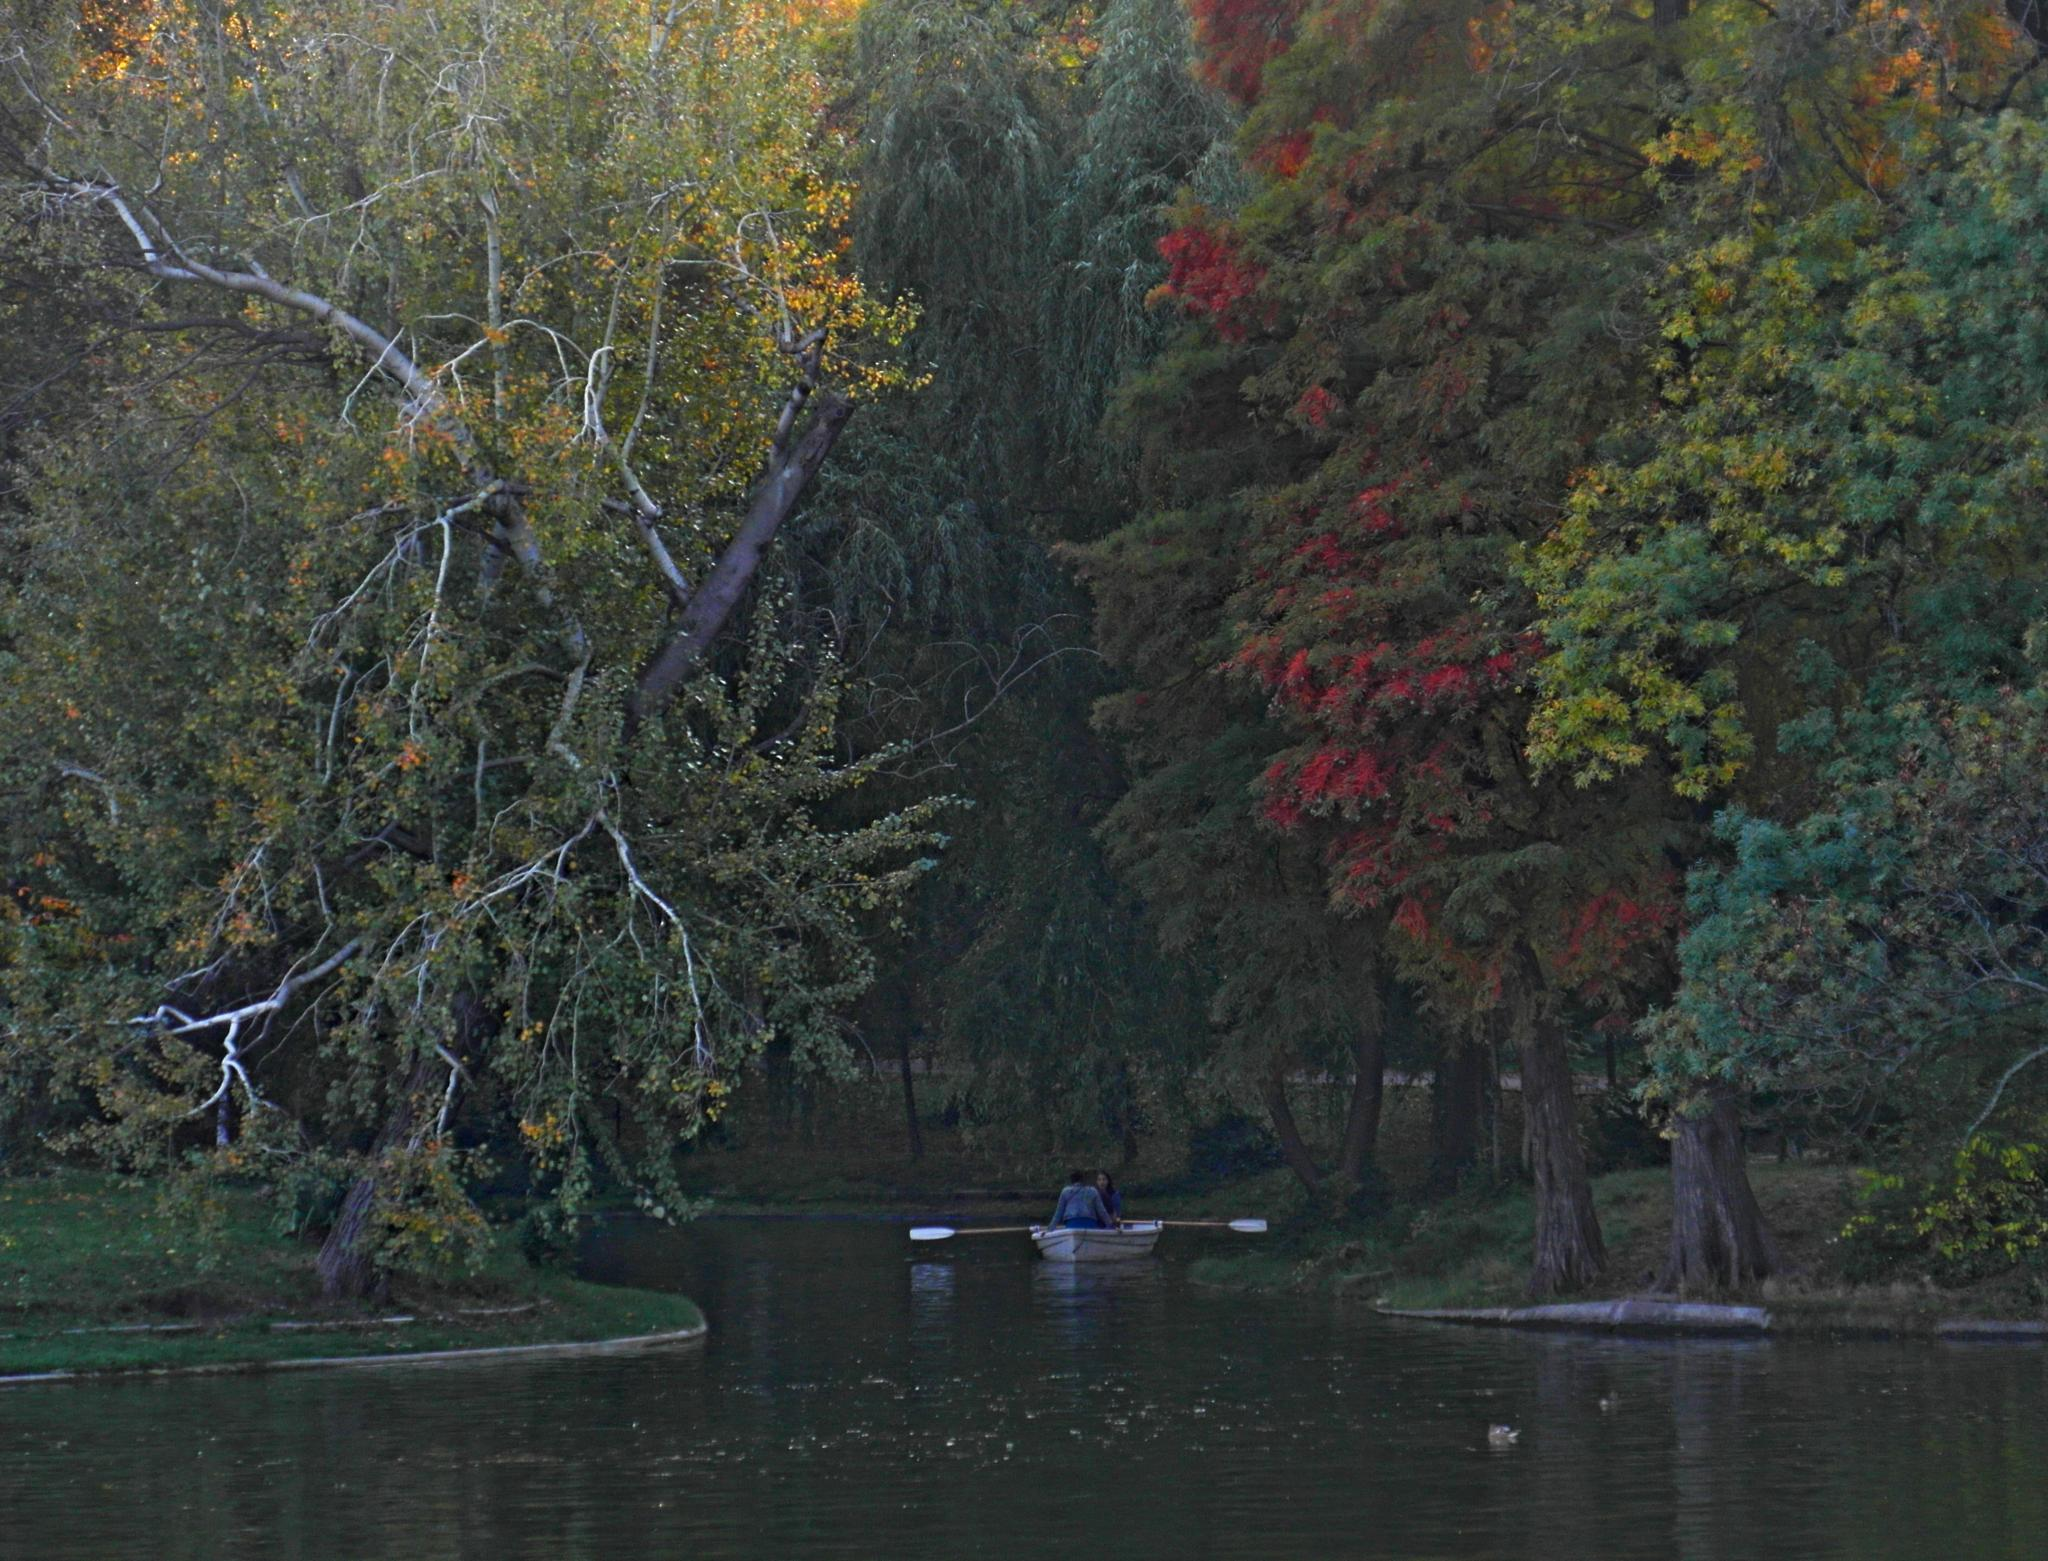 Bucharest.Carol park. by staicugheorghe3